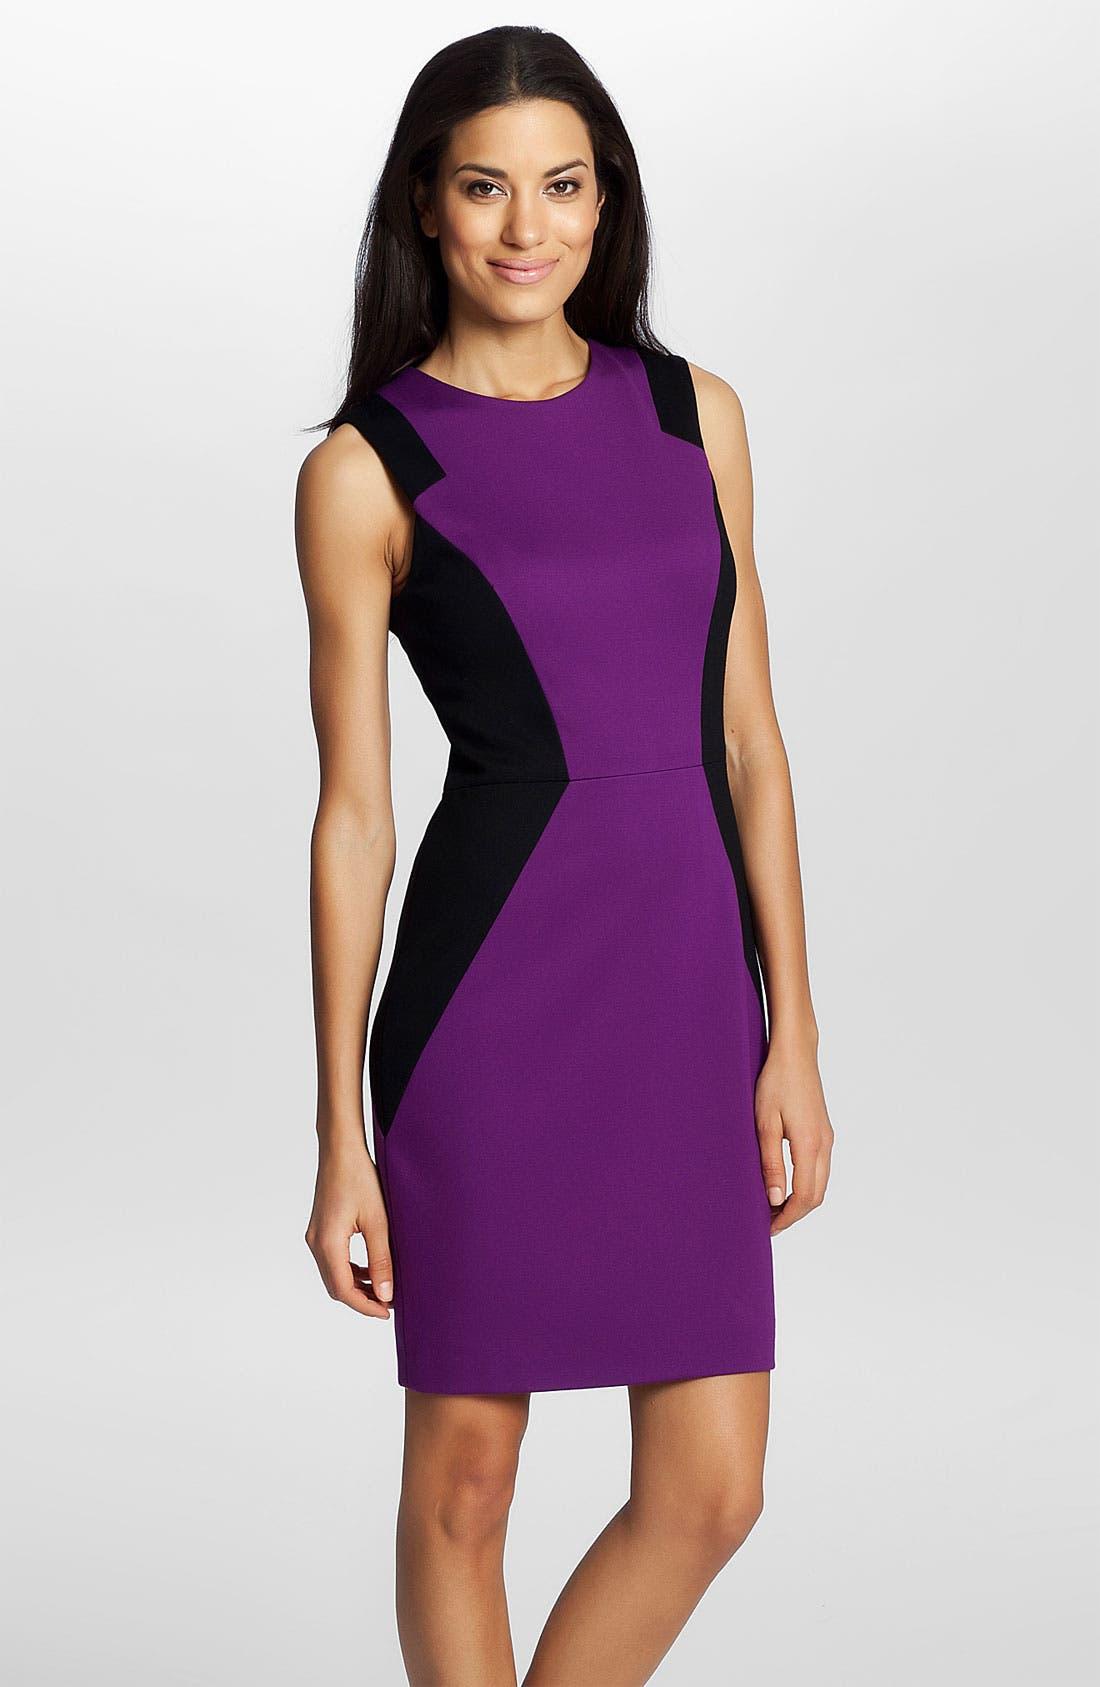 Alternate Image 1 Selected - Cynthia Steffe 'Aubrey' Colorblock Ponte Dress